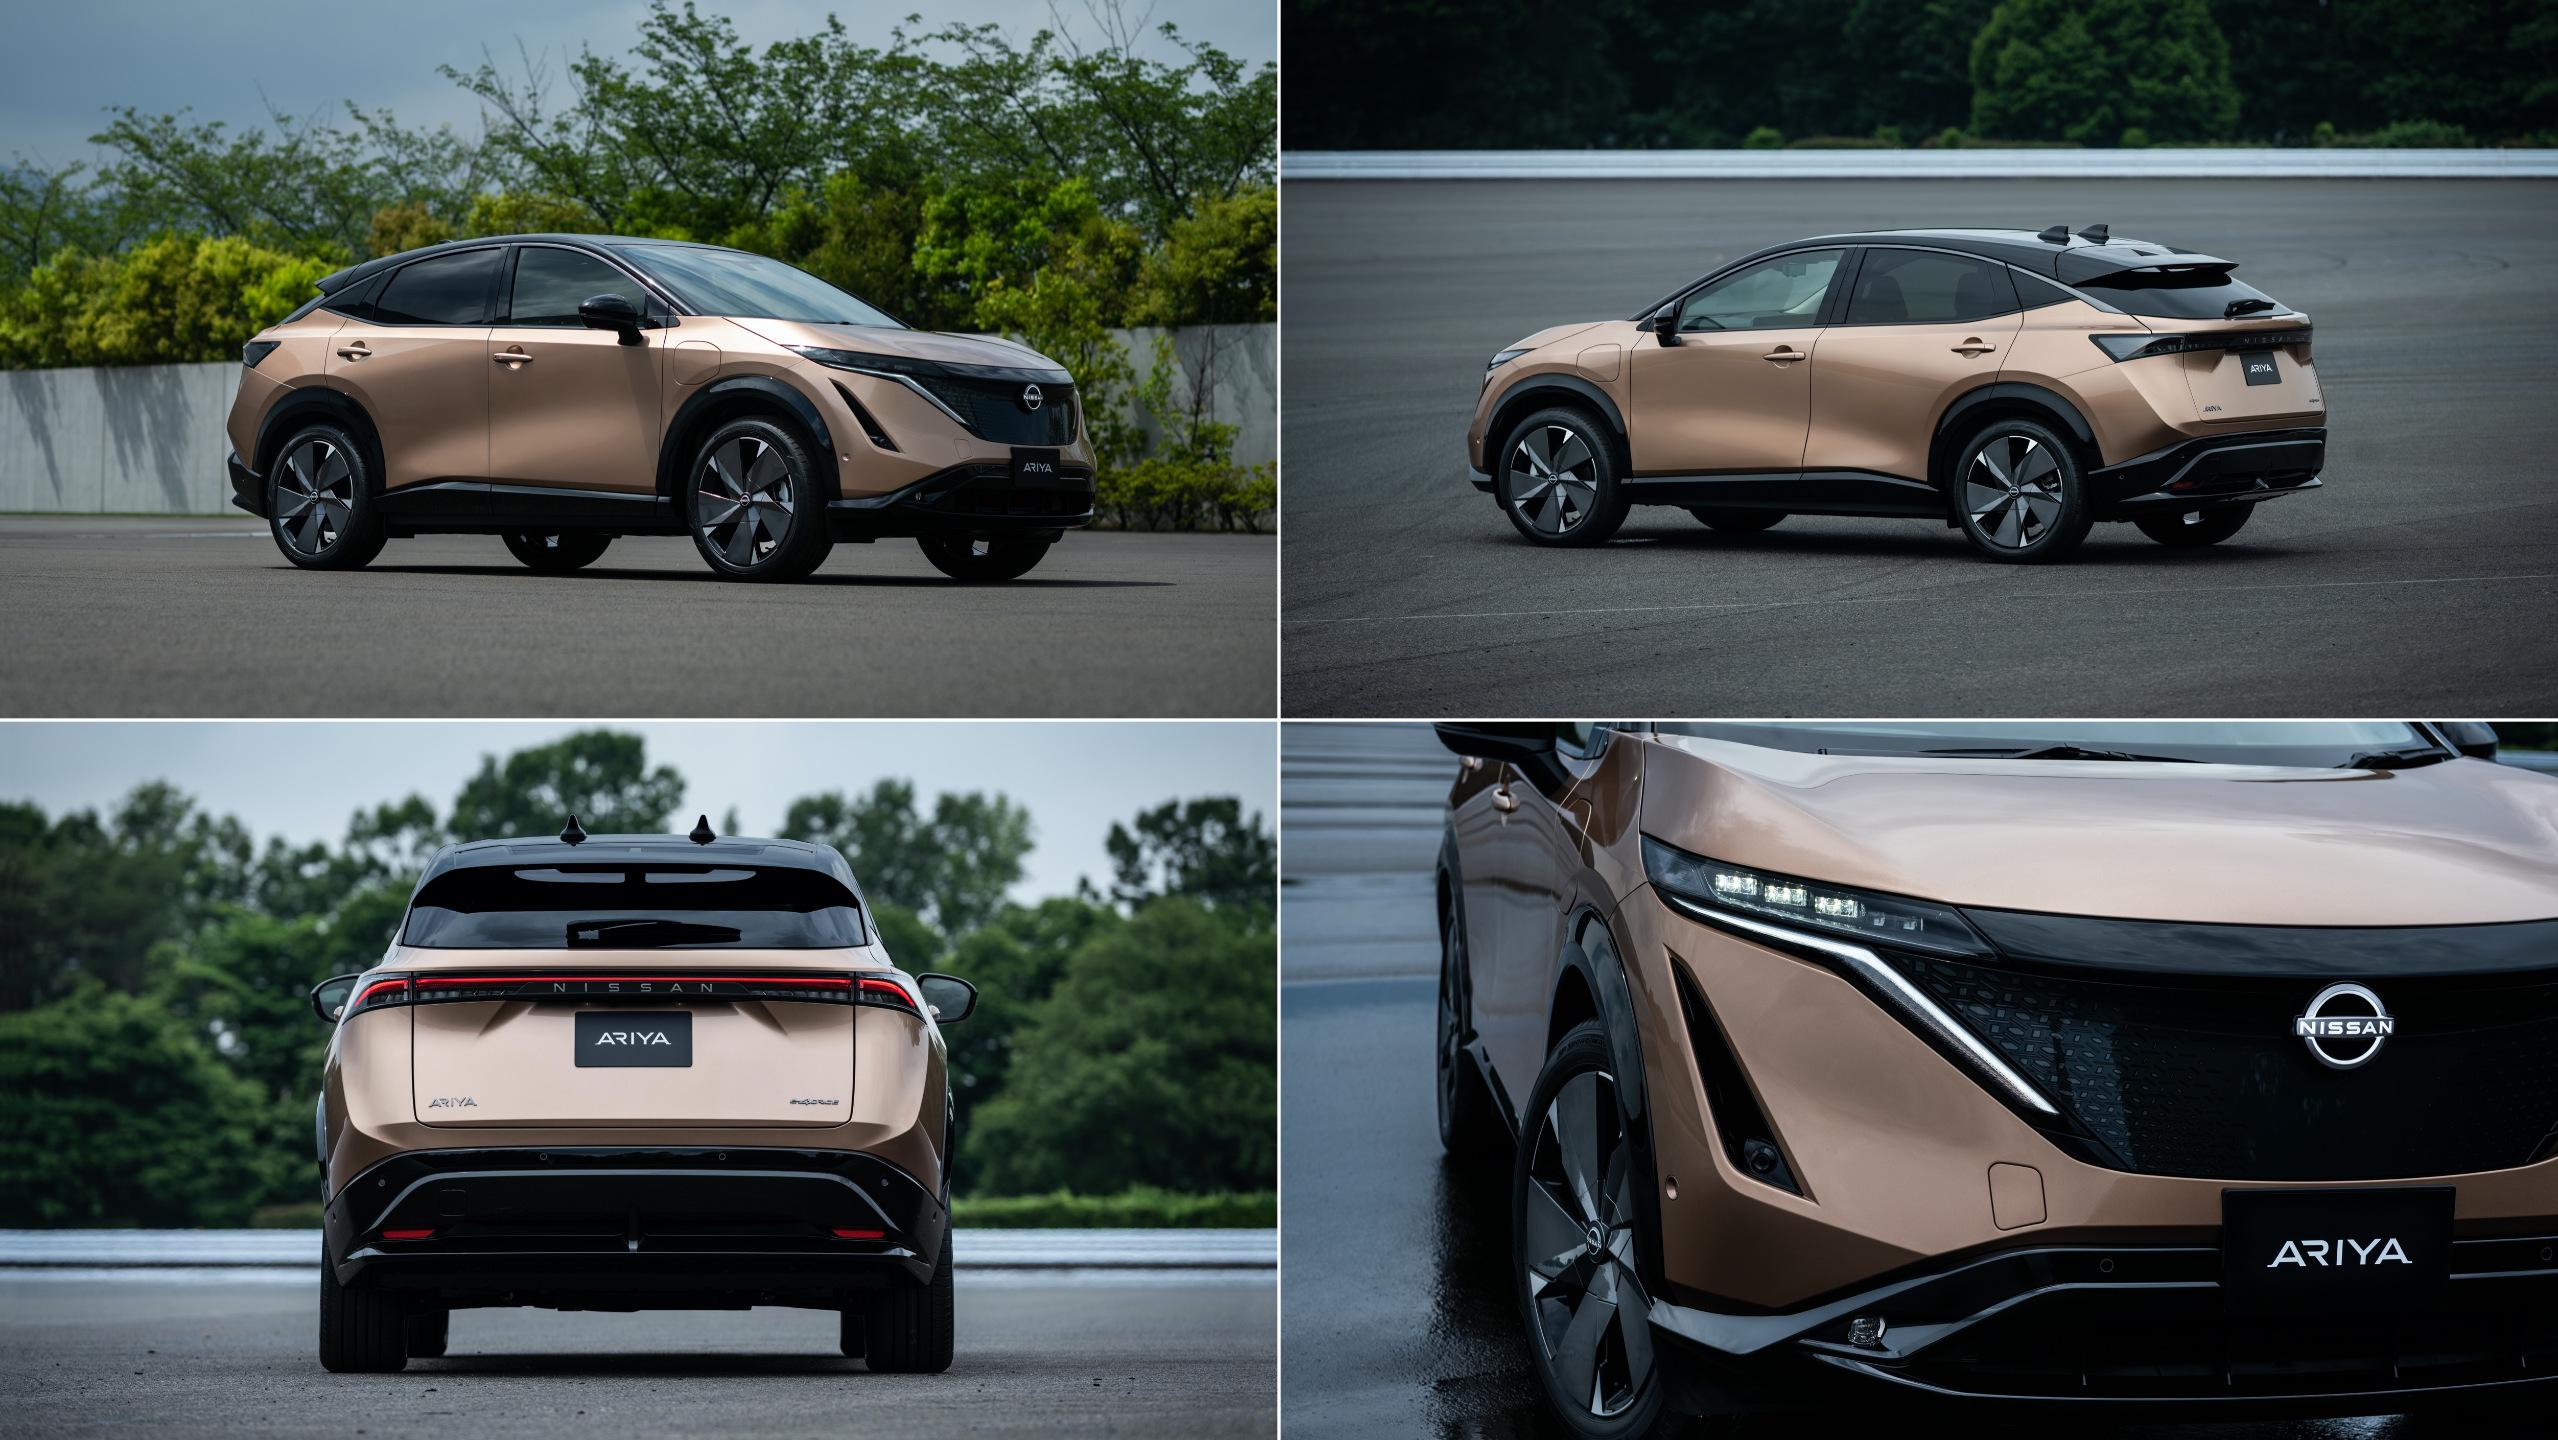 Nissan Unveils The Futuristic Looking Ariya Electric Suv